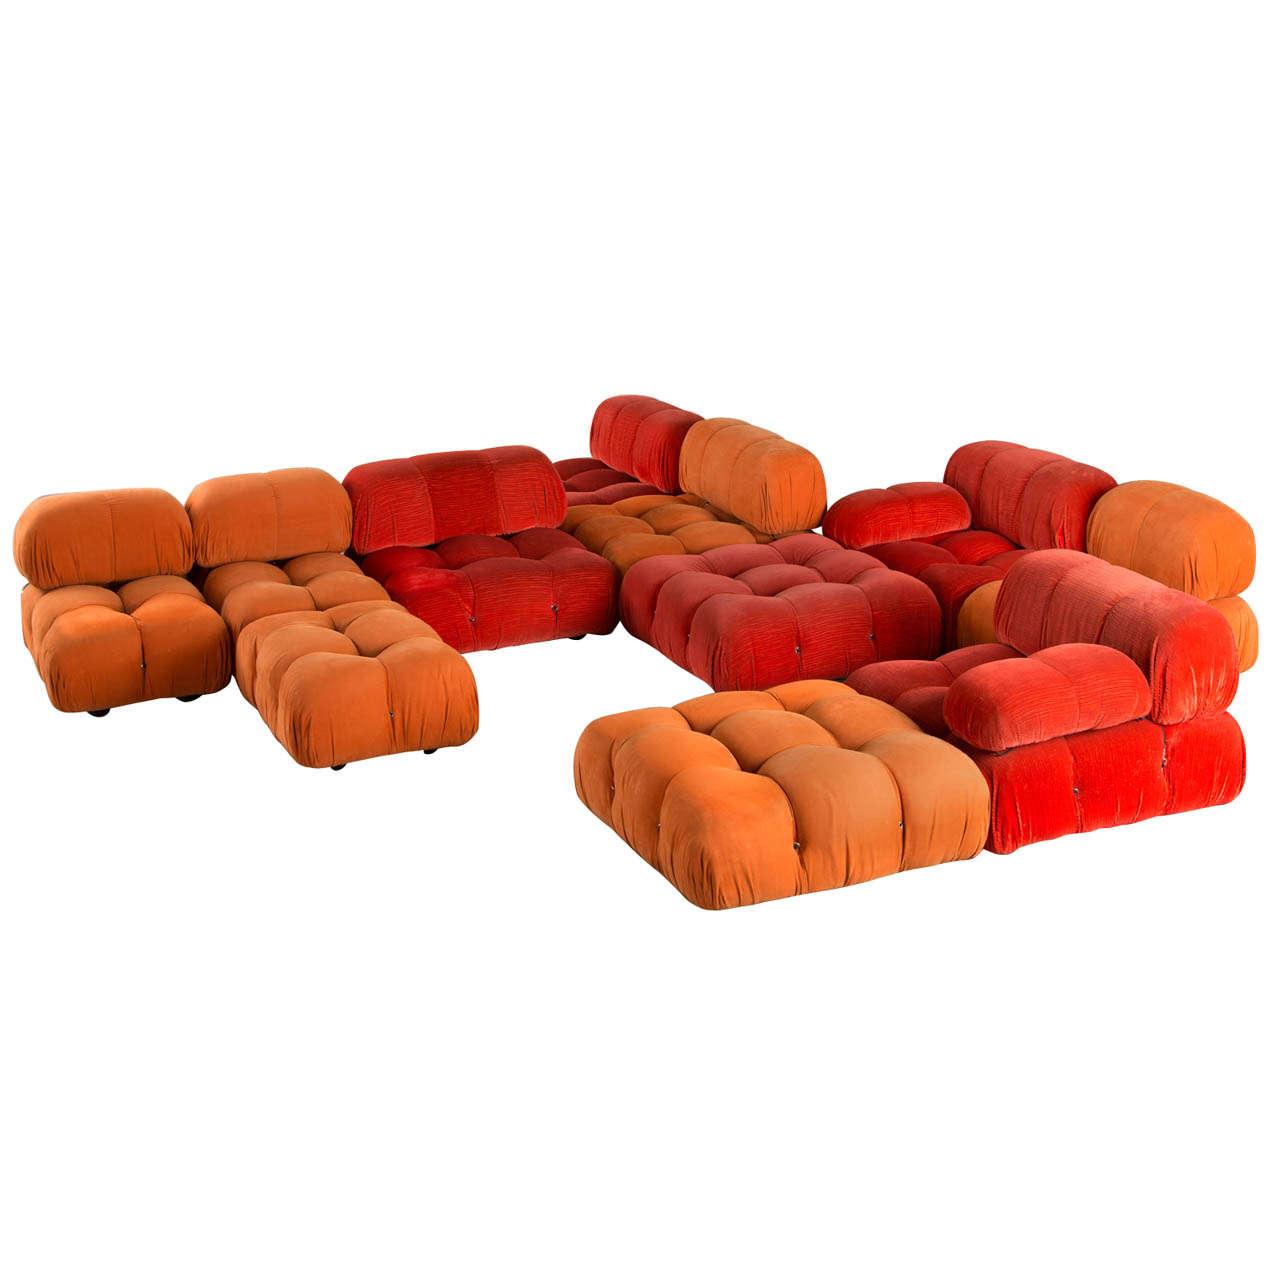 39 camaleonda 39 modular sofa by mario bellini for c b italia 1970 39 s at 1stdibs. Black Bedroom Furniture Sets. Home Design Ideas